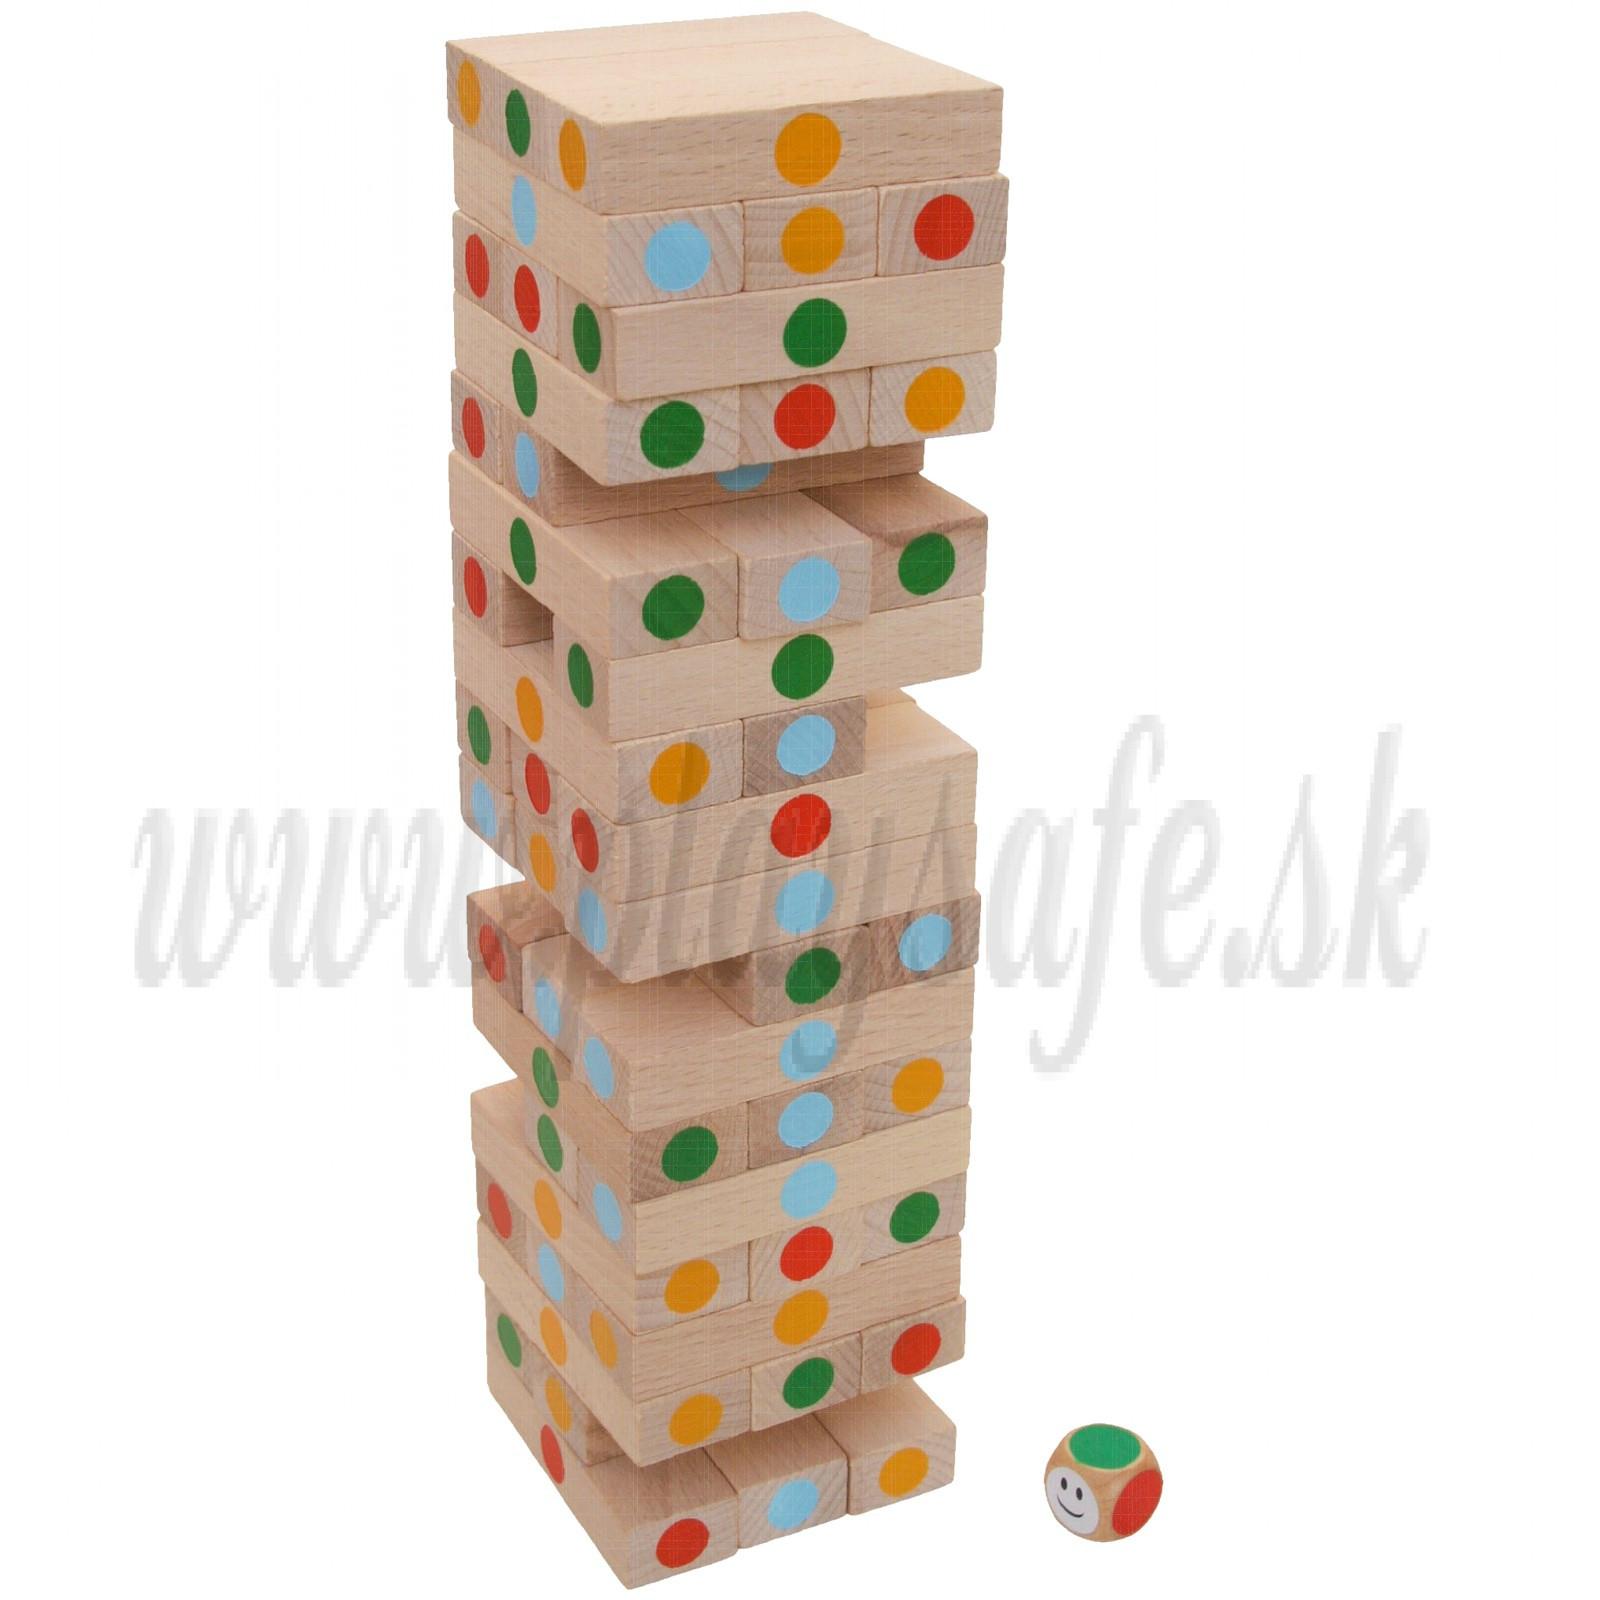 MIK Wooden Tumbling Jenga Tower Mikado Game Colored